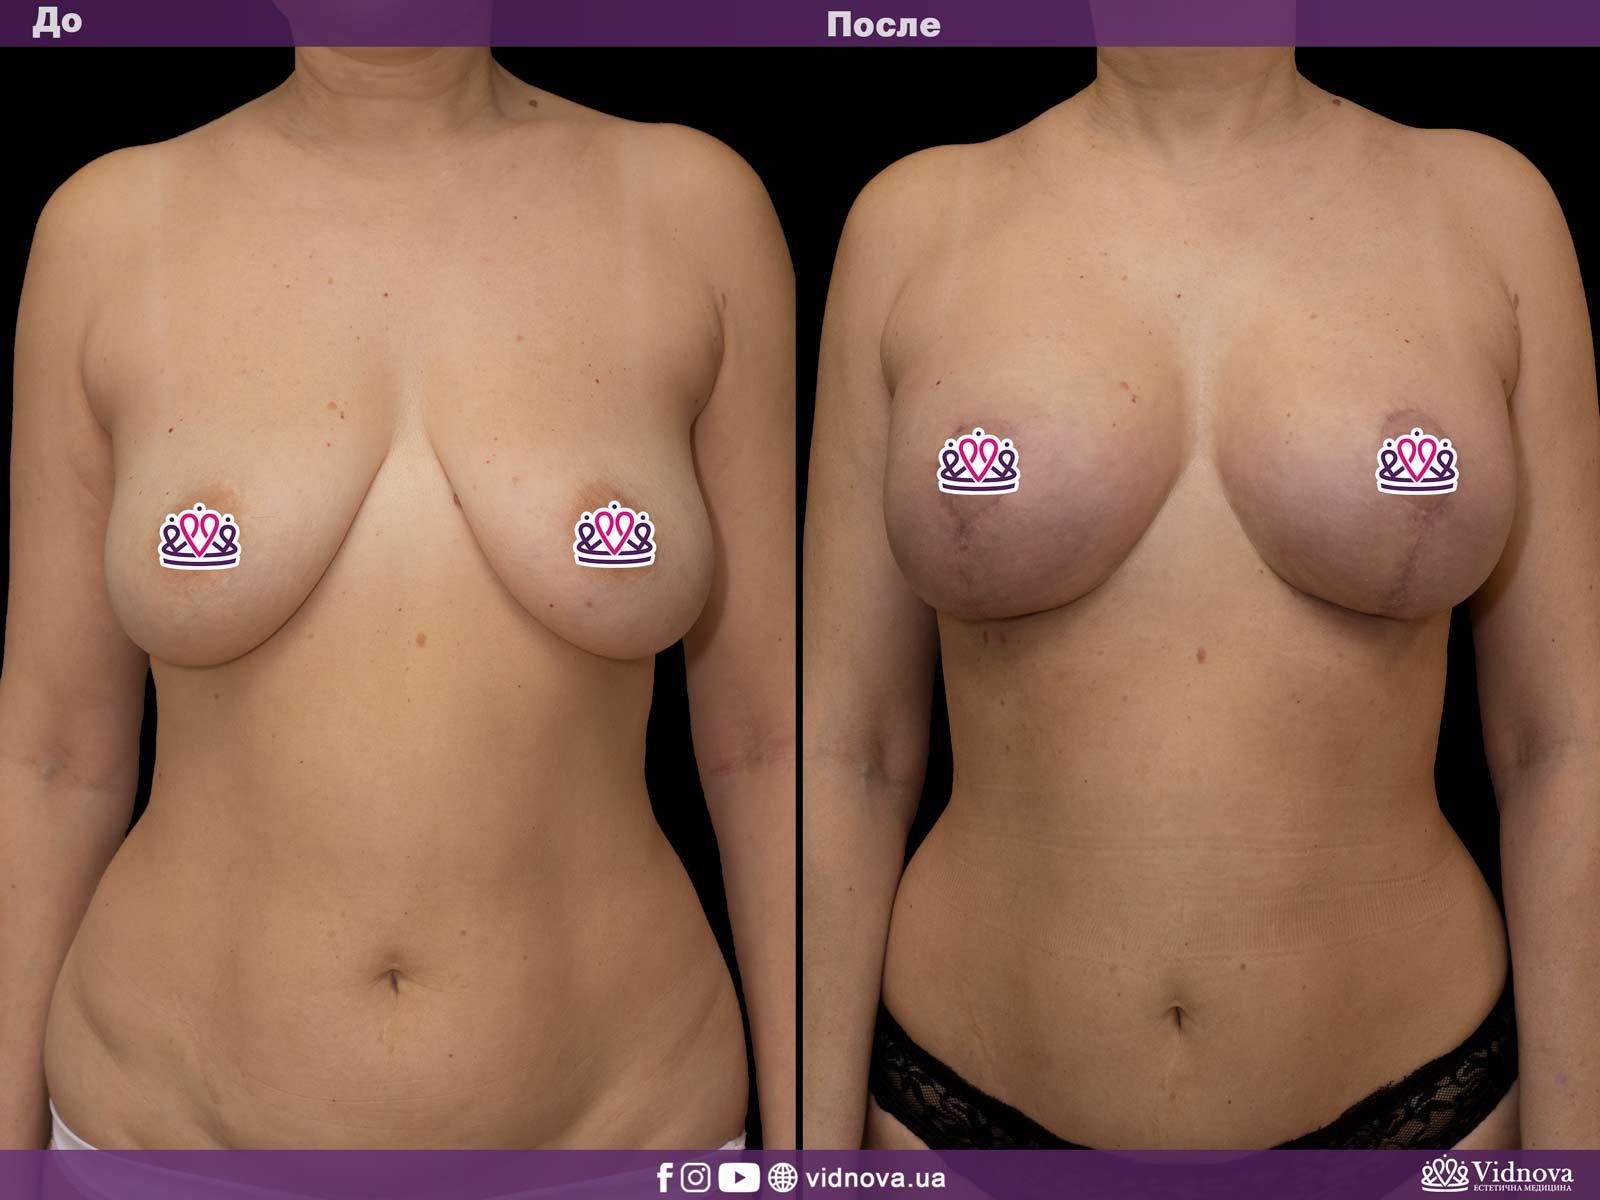 Подтяжка груди: Фото ДО и ПОСЛЕ - Пример №15-1 - Клиника Vidnova